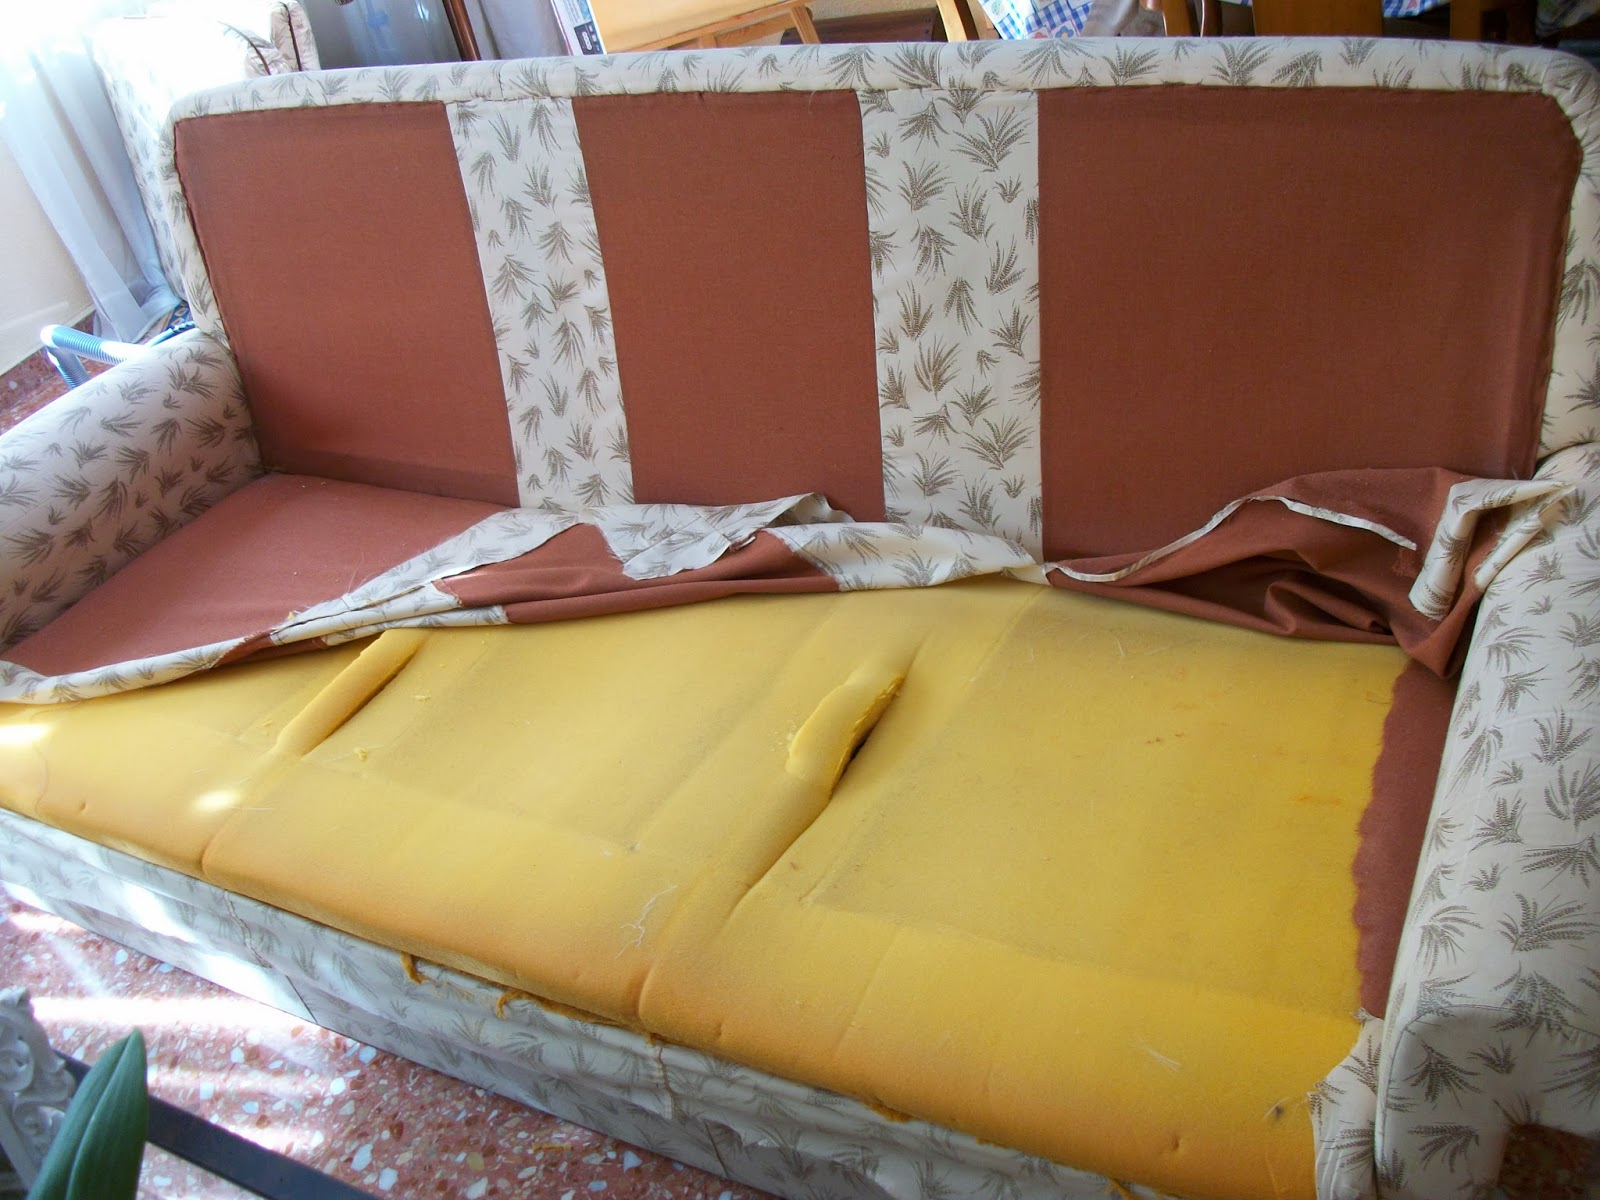 Restauraci n el palisandro tapizar un sof - Telas para tapizar sofas ...